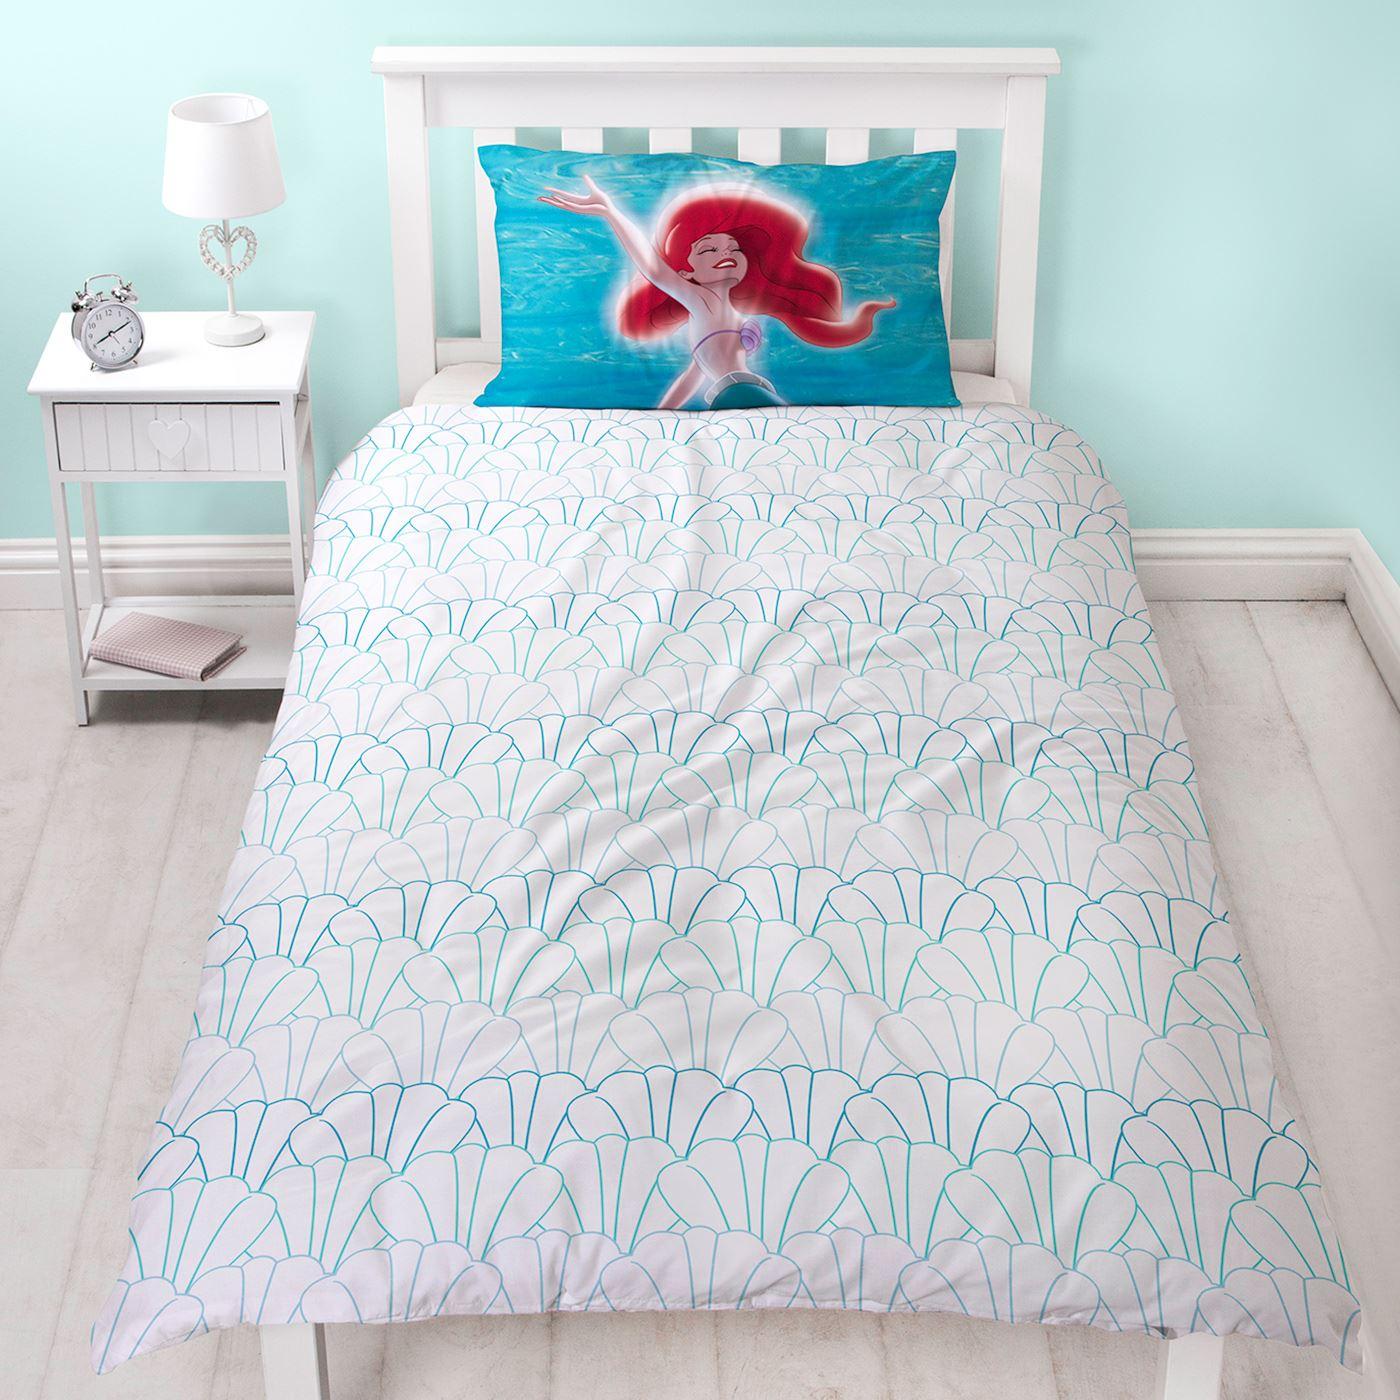 Disney Princess Ariel Mermaid Duvet Cover Set Curtains